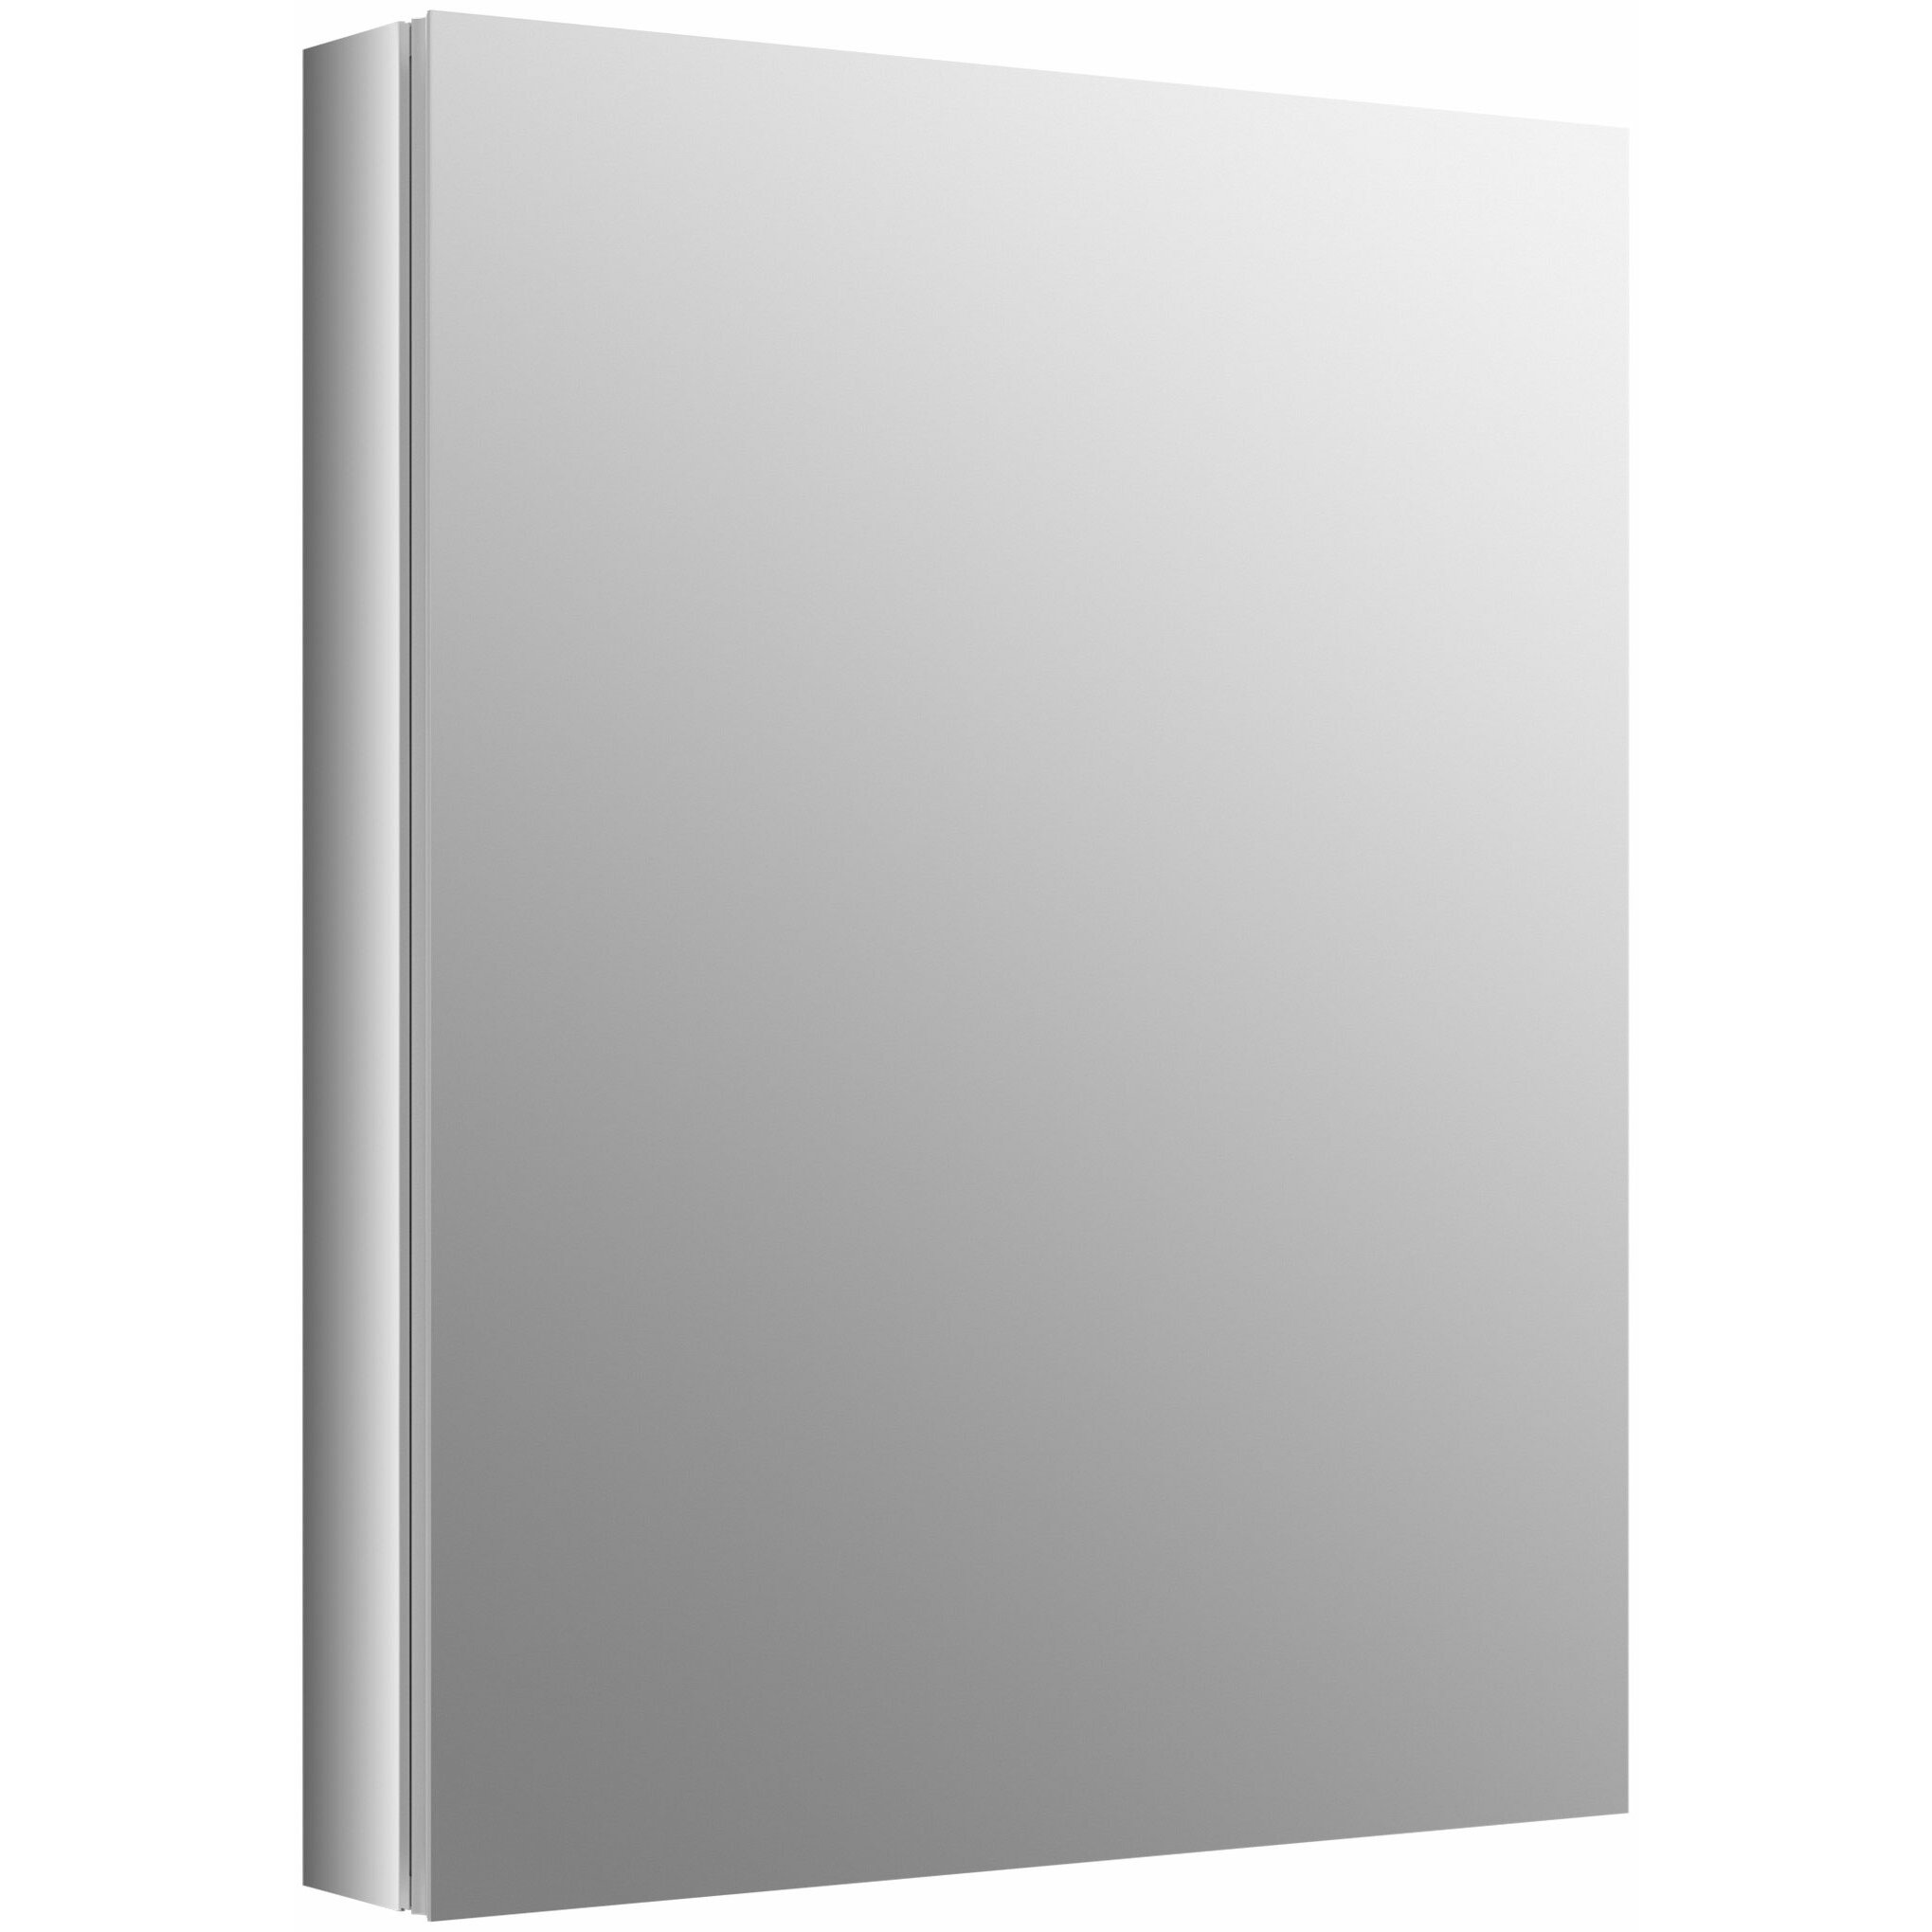 Jensen Medicine Cabinet Kohler Verdera 24 W X 30 H Aluminum Medicine Cabinet Reviews